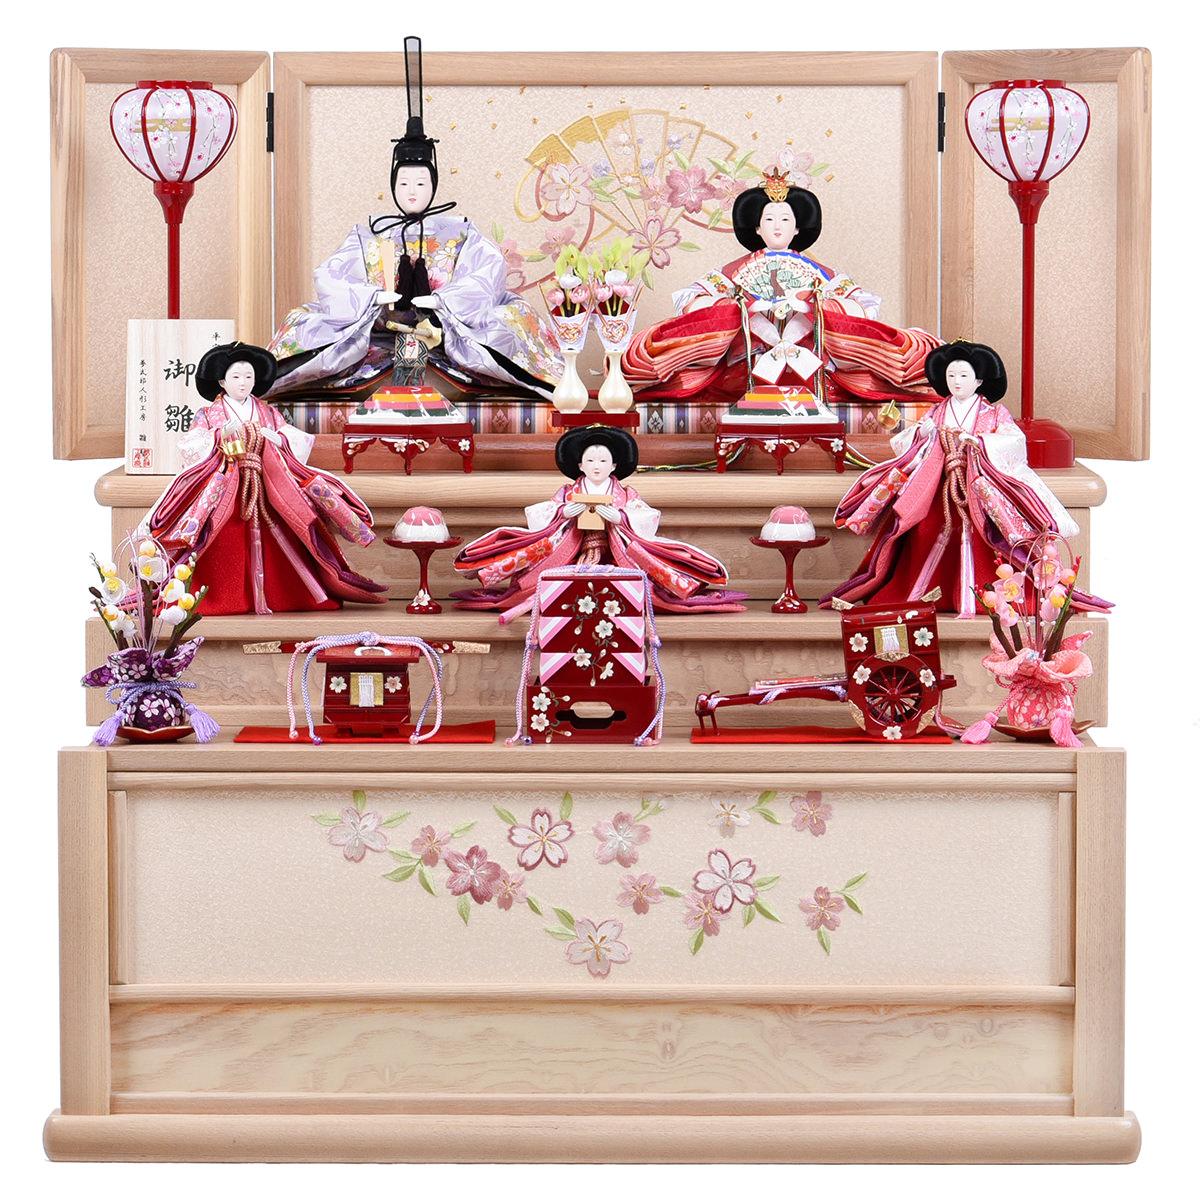 雛人形 収納台 五人飾り 三段飾り 三五 引き出し収納台5人飾 雛聖 送料無料